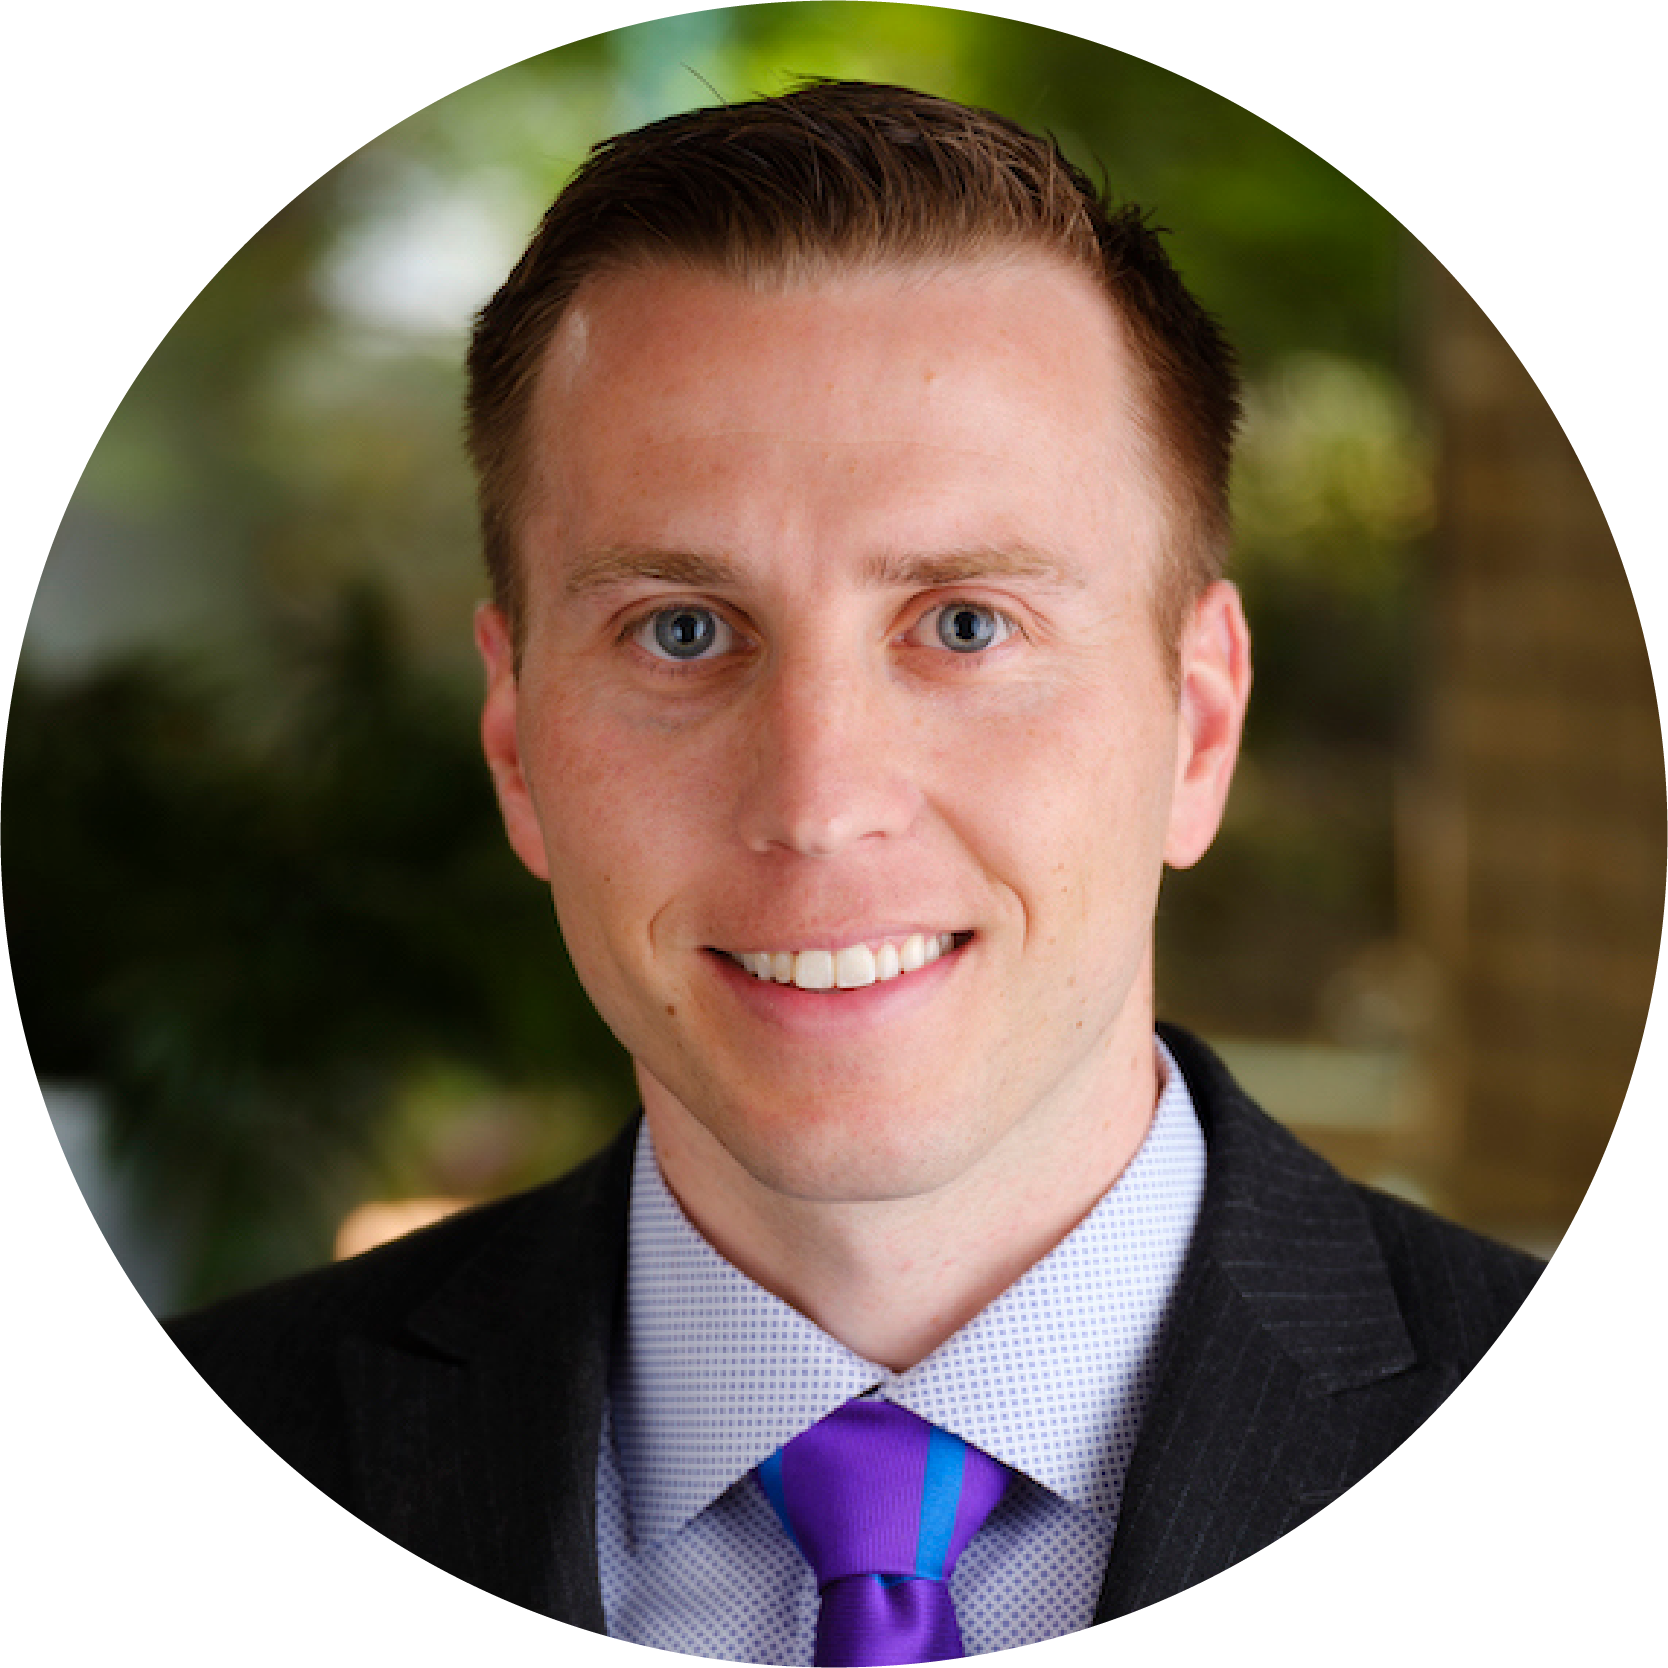 Michael Garff, MBA